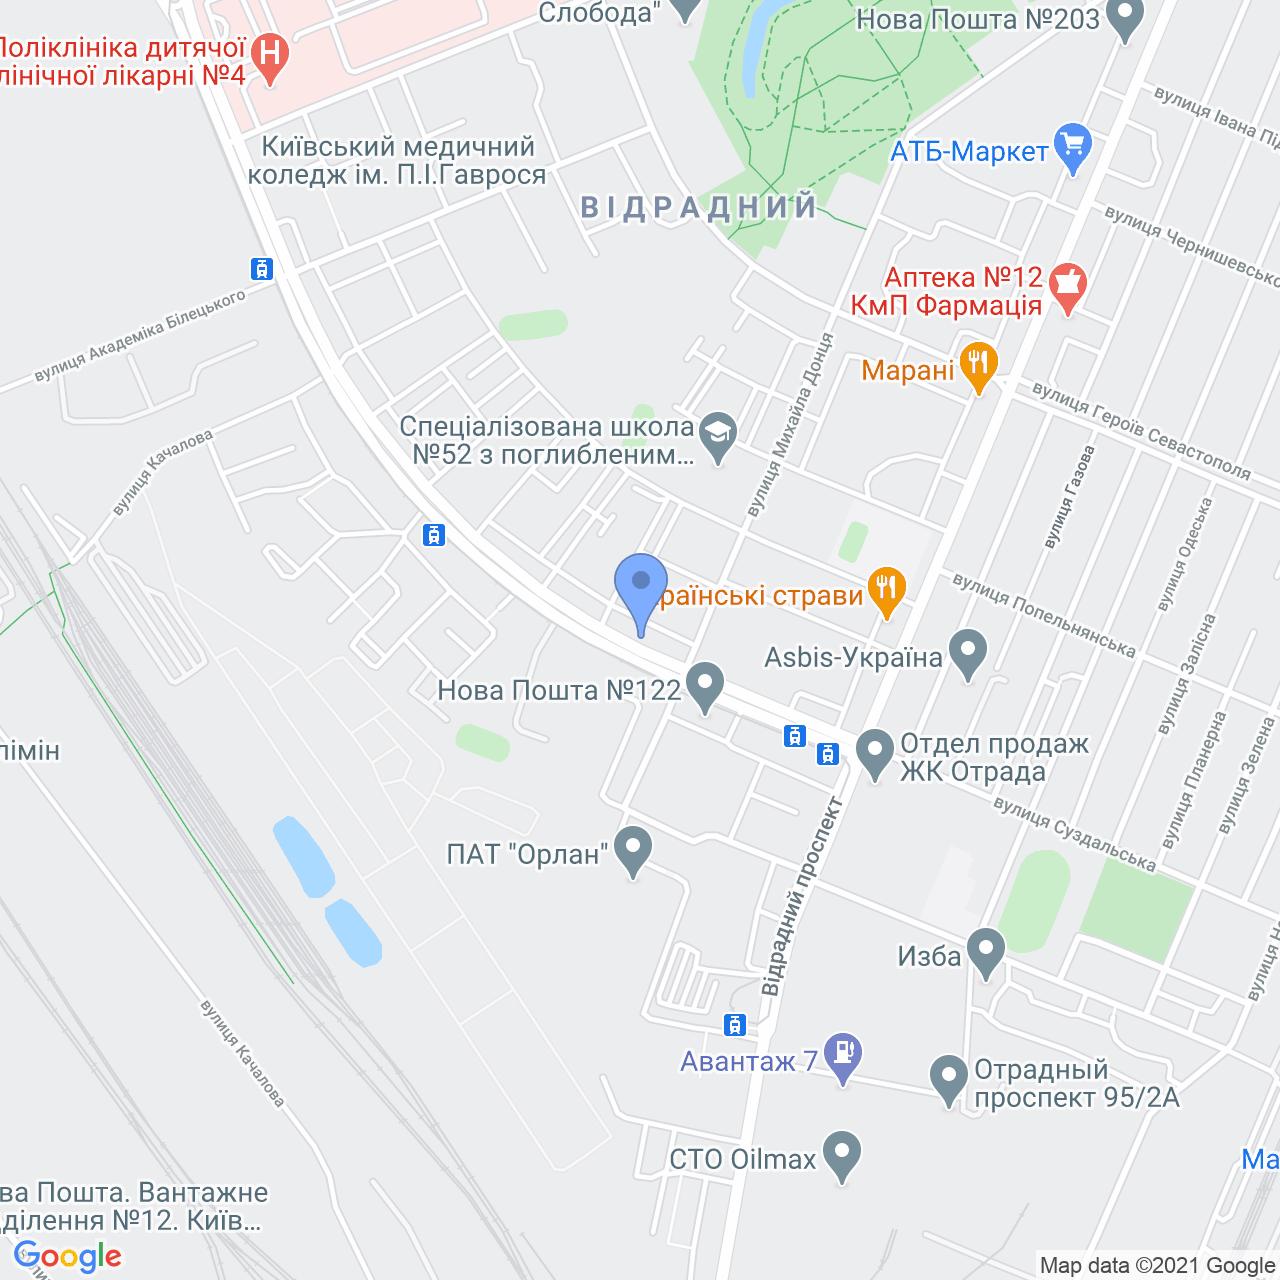 mob object static map